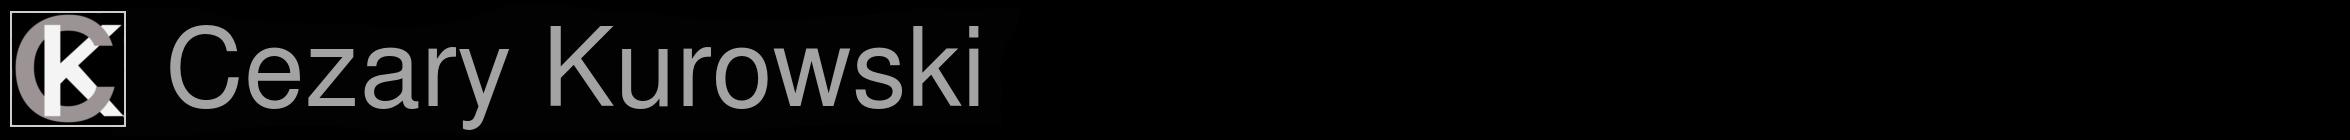 Cezary Kurowski Logo